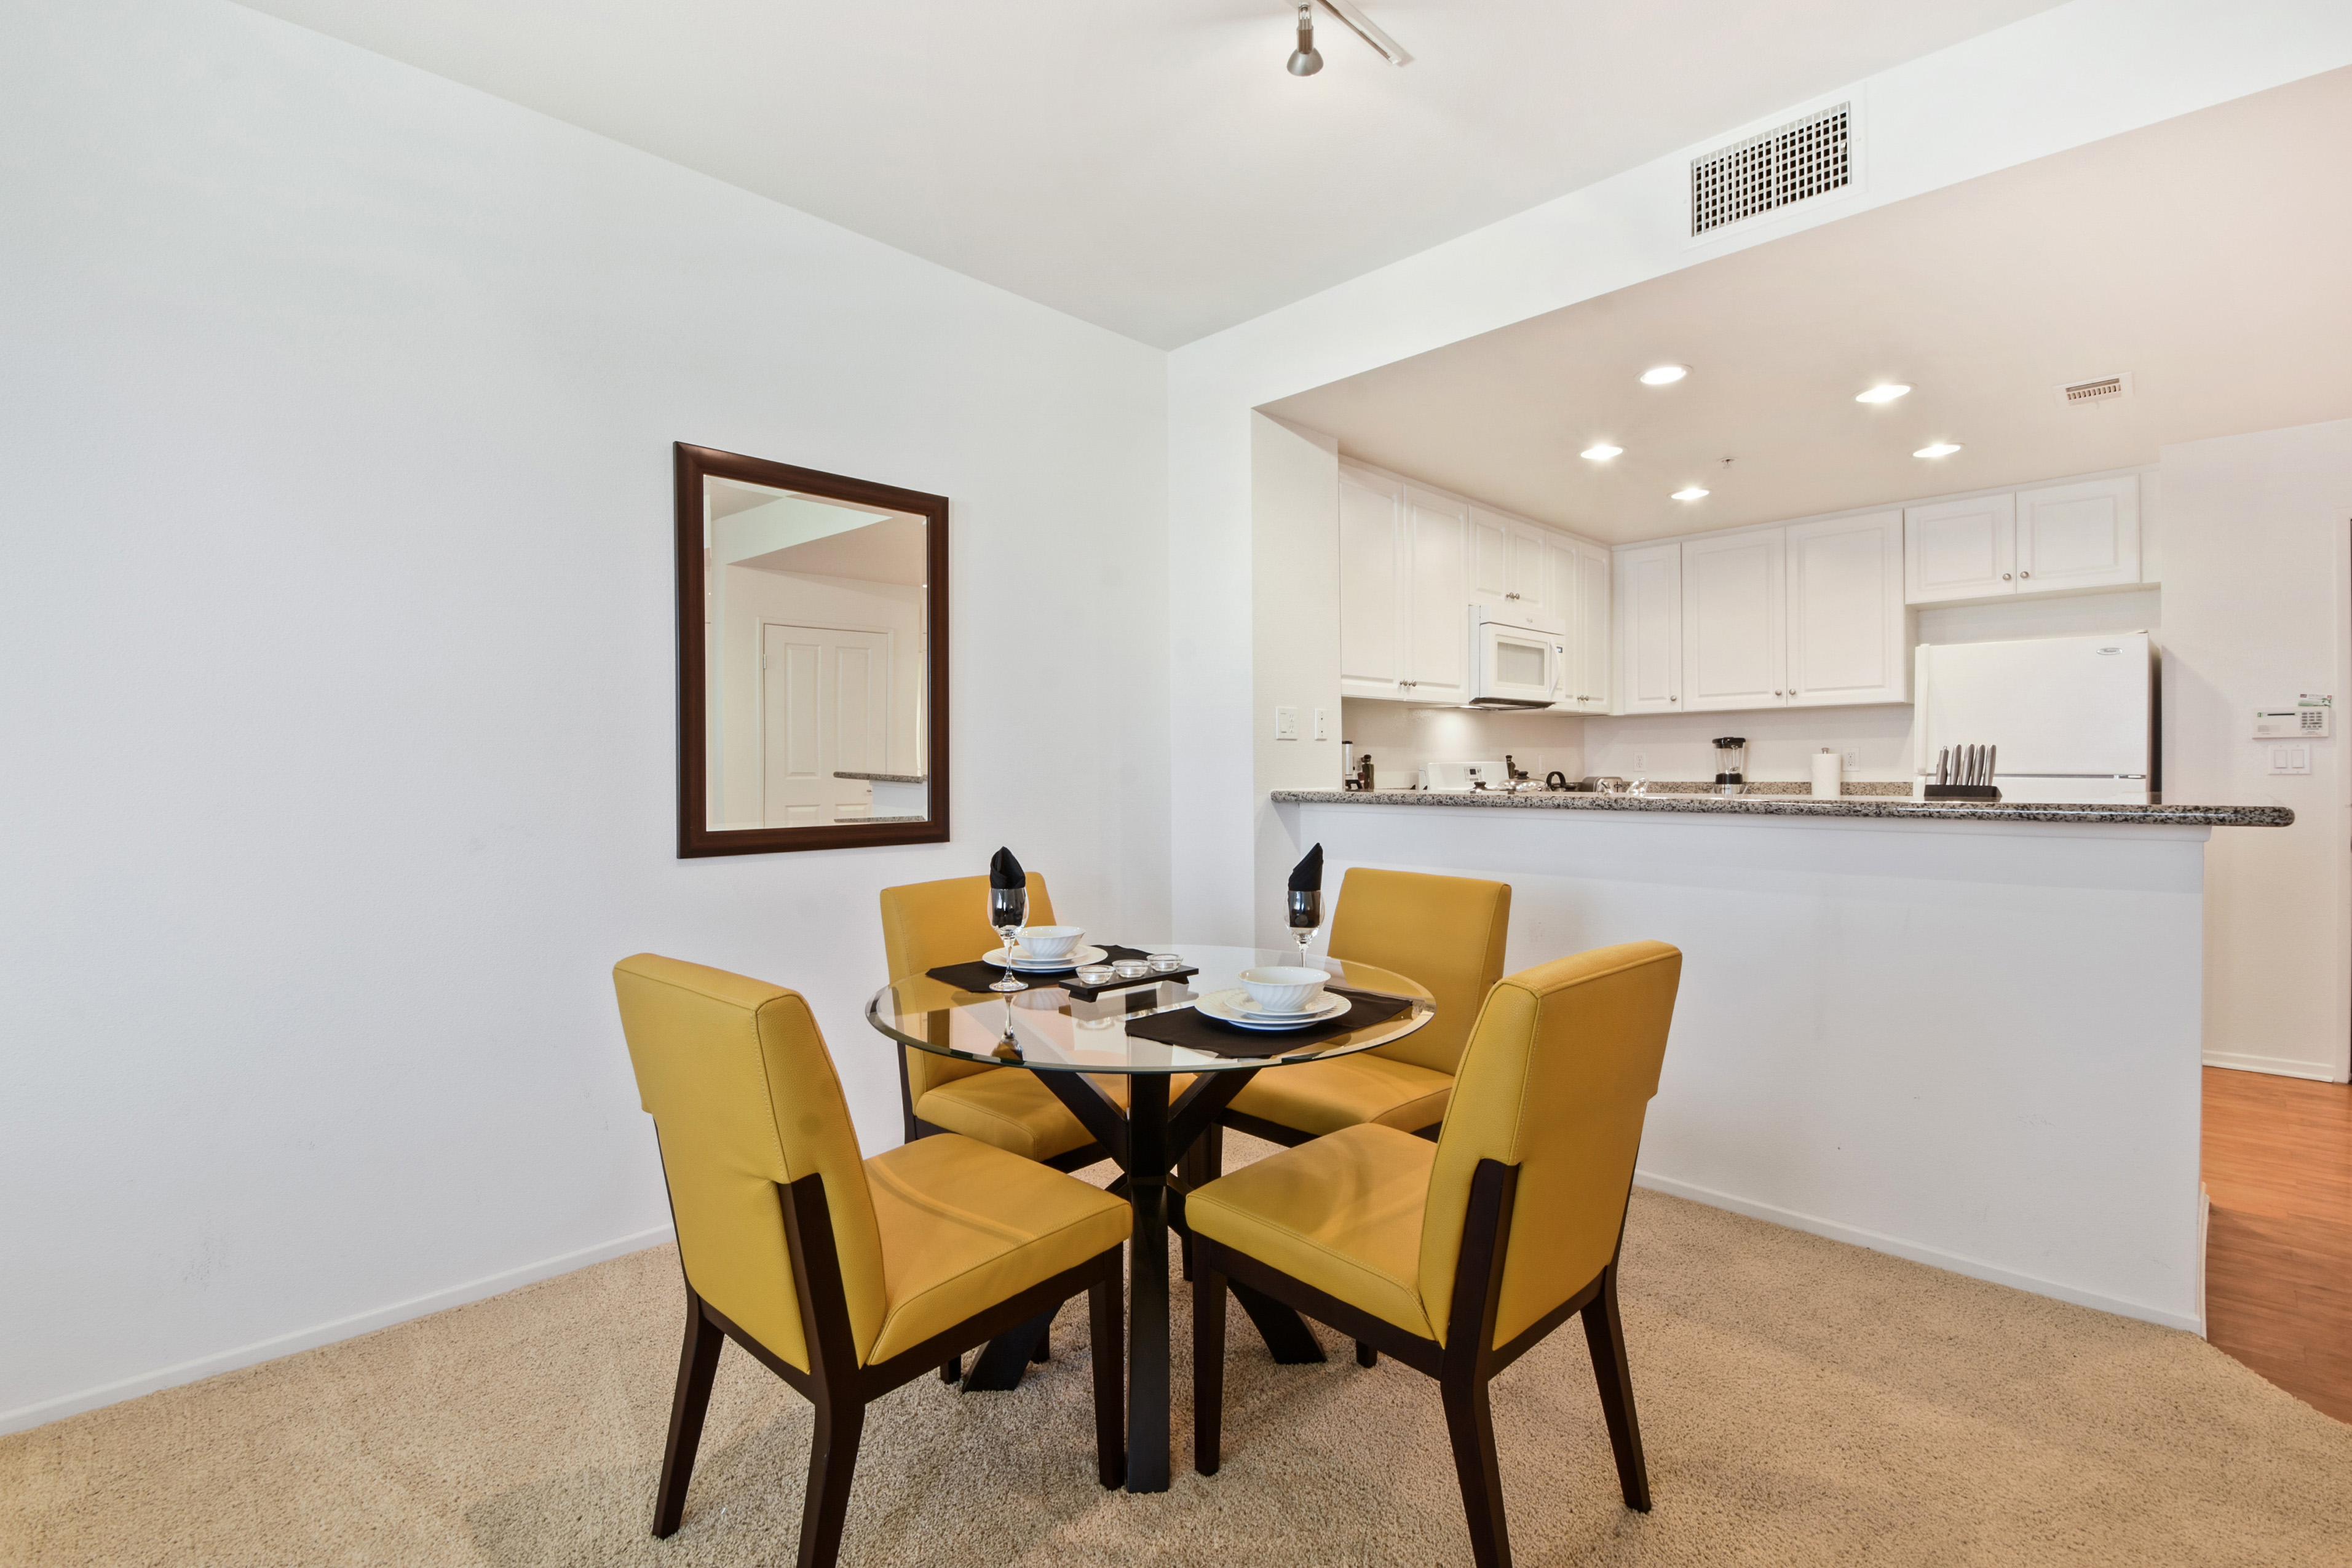 image 5 furnished 1 bedroom Apartment for rent in Irvine, Orange County